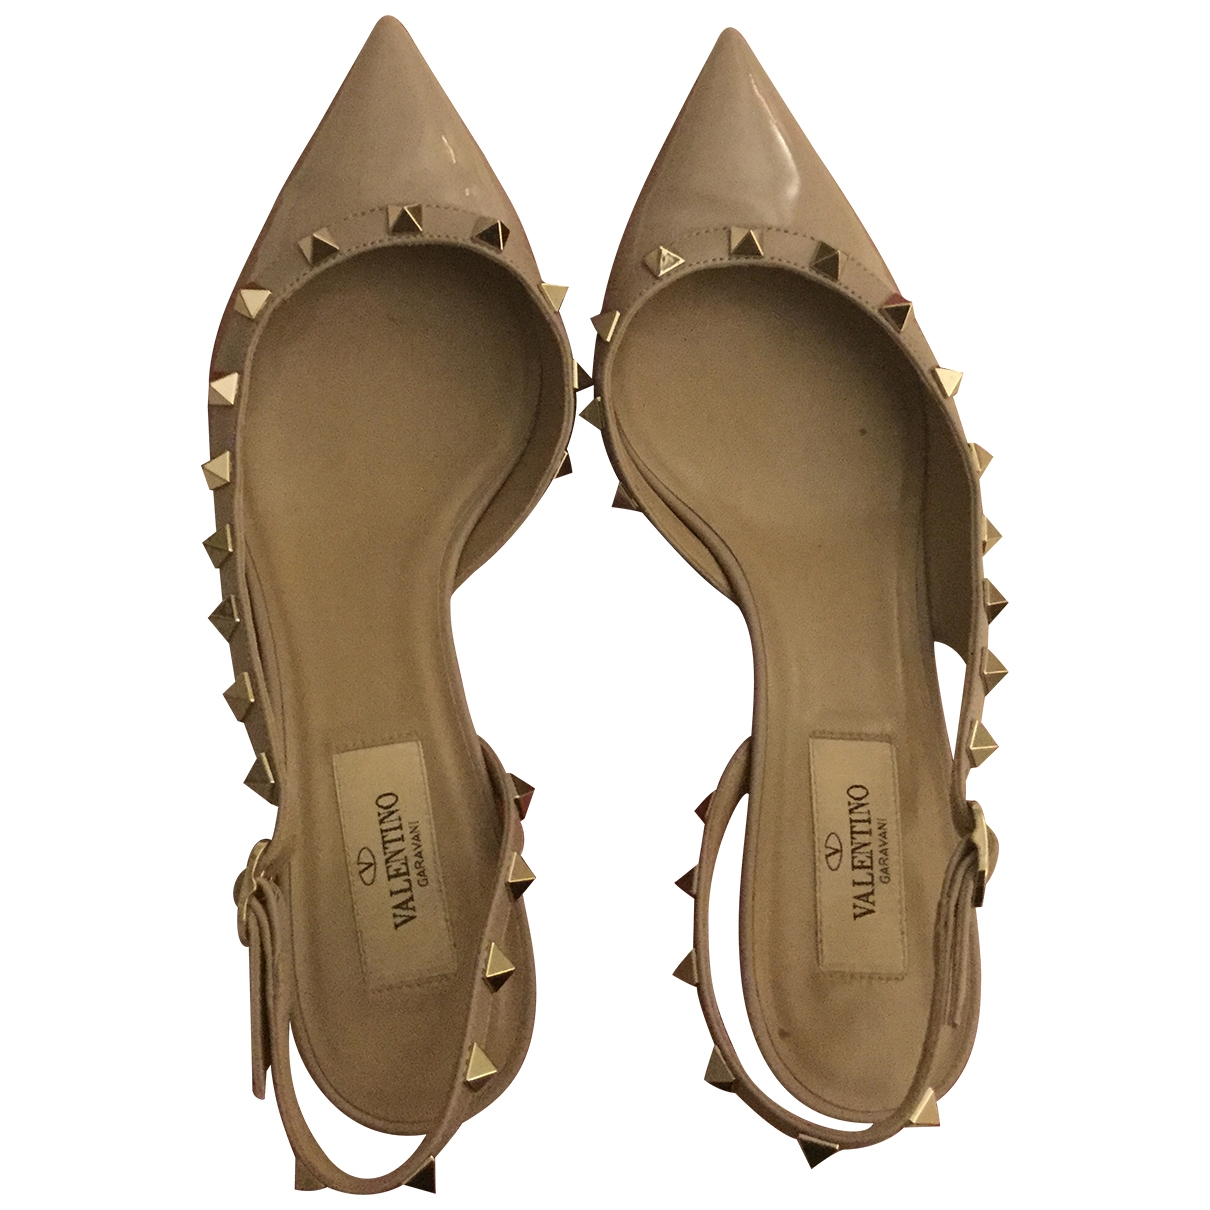 Valentino Garavani Rockstud Beige Patent leather Heels for Women 37 IT